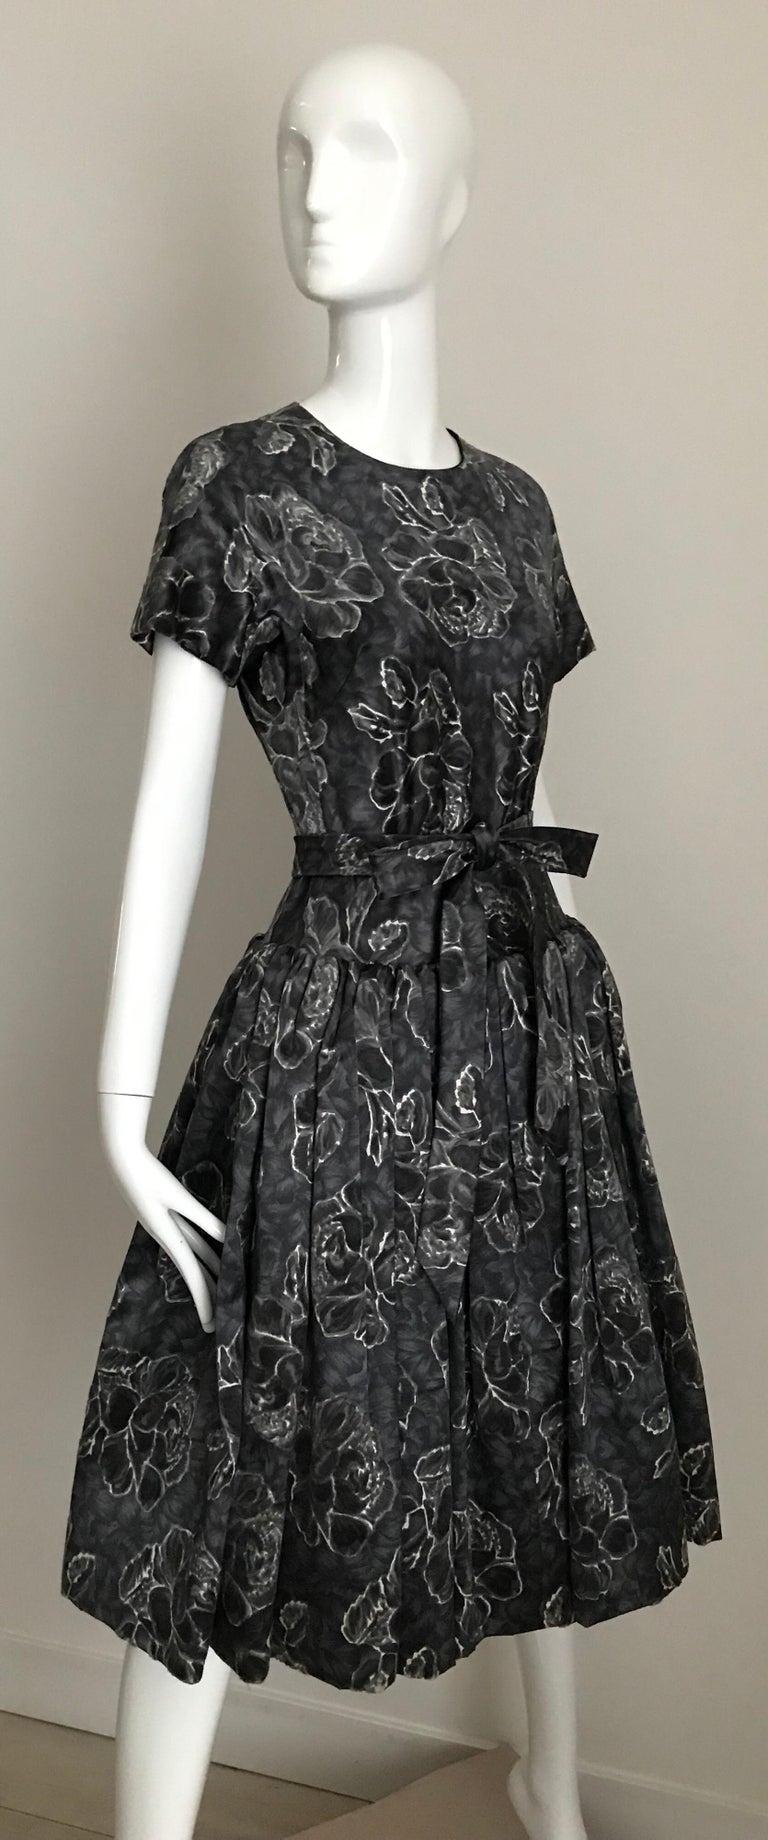 Vintage Norman Norell Blue and Grey Floral Print Silk Velvet Cocktail Dress  For Sale 6